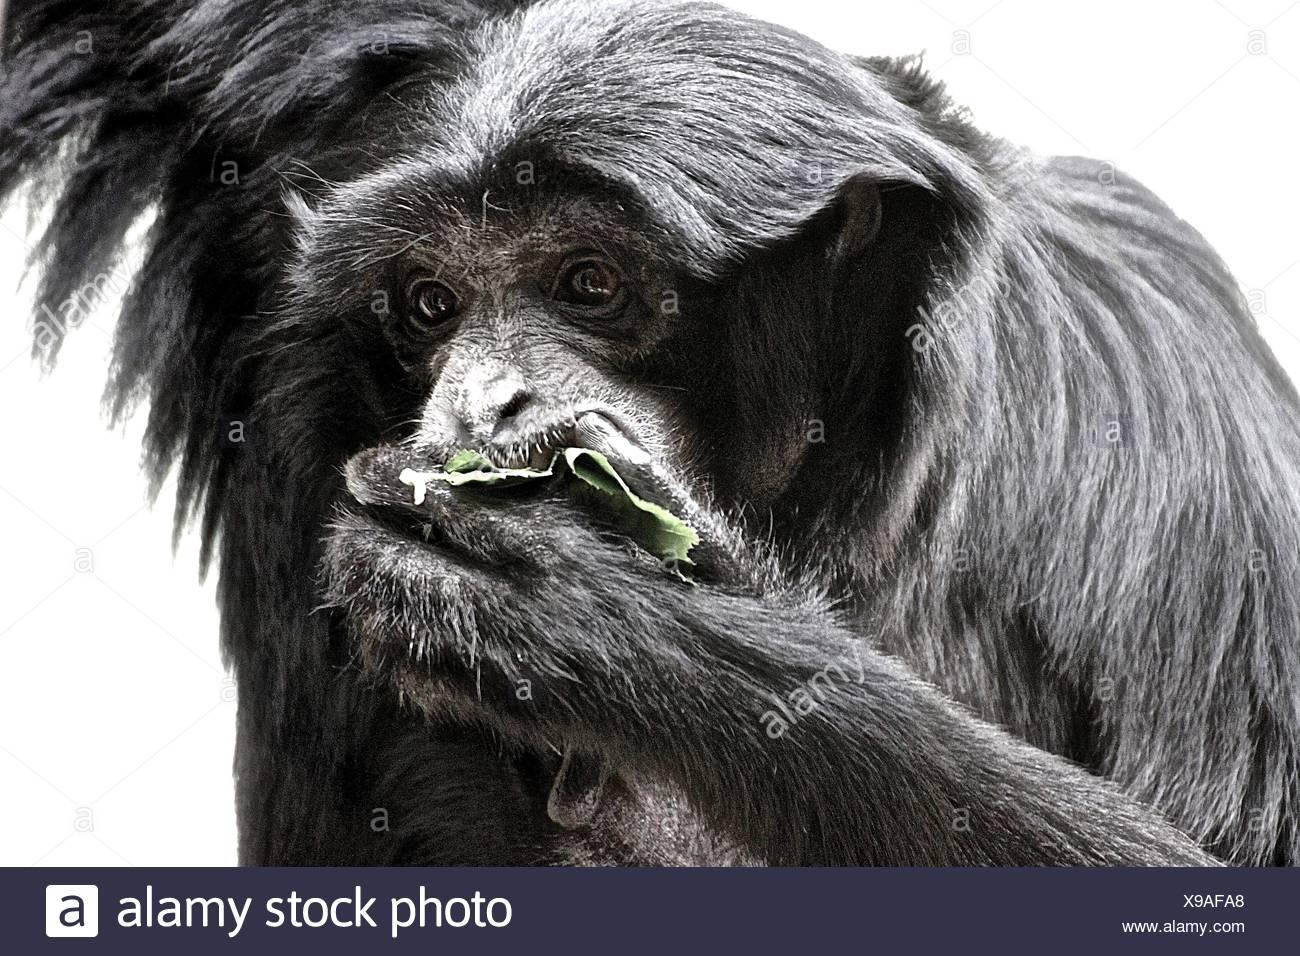 Monkey Feeding At Zoo Stock Photo